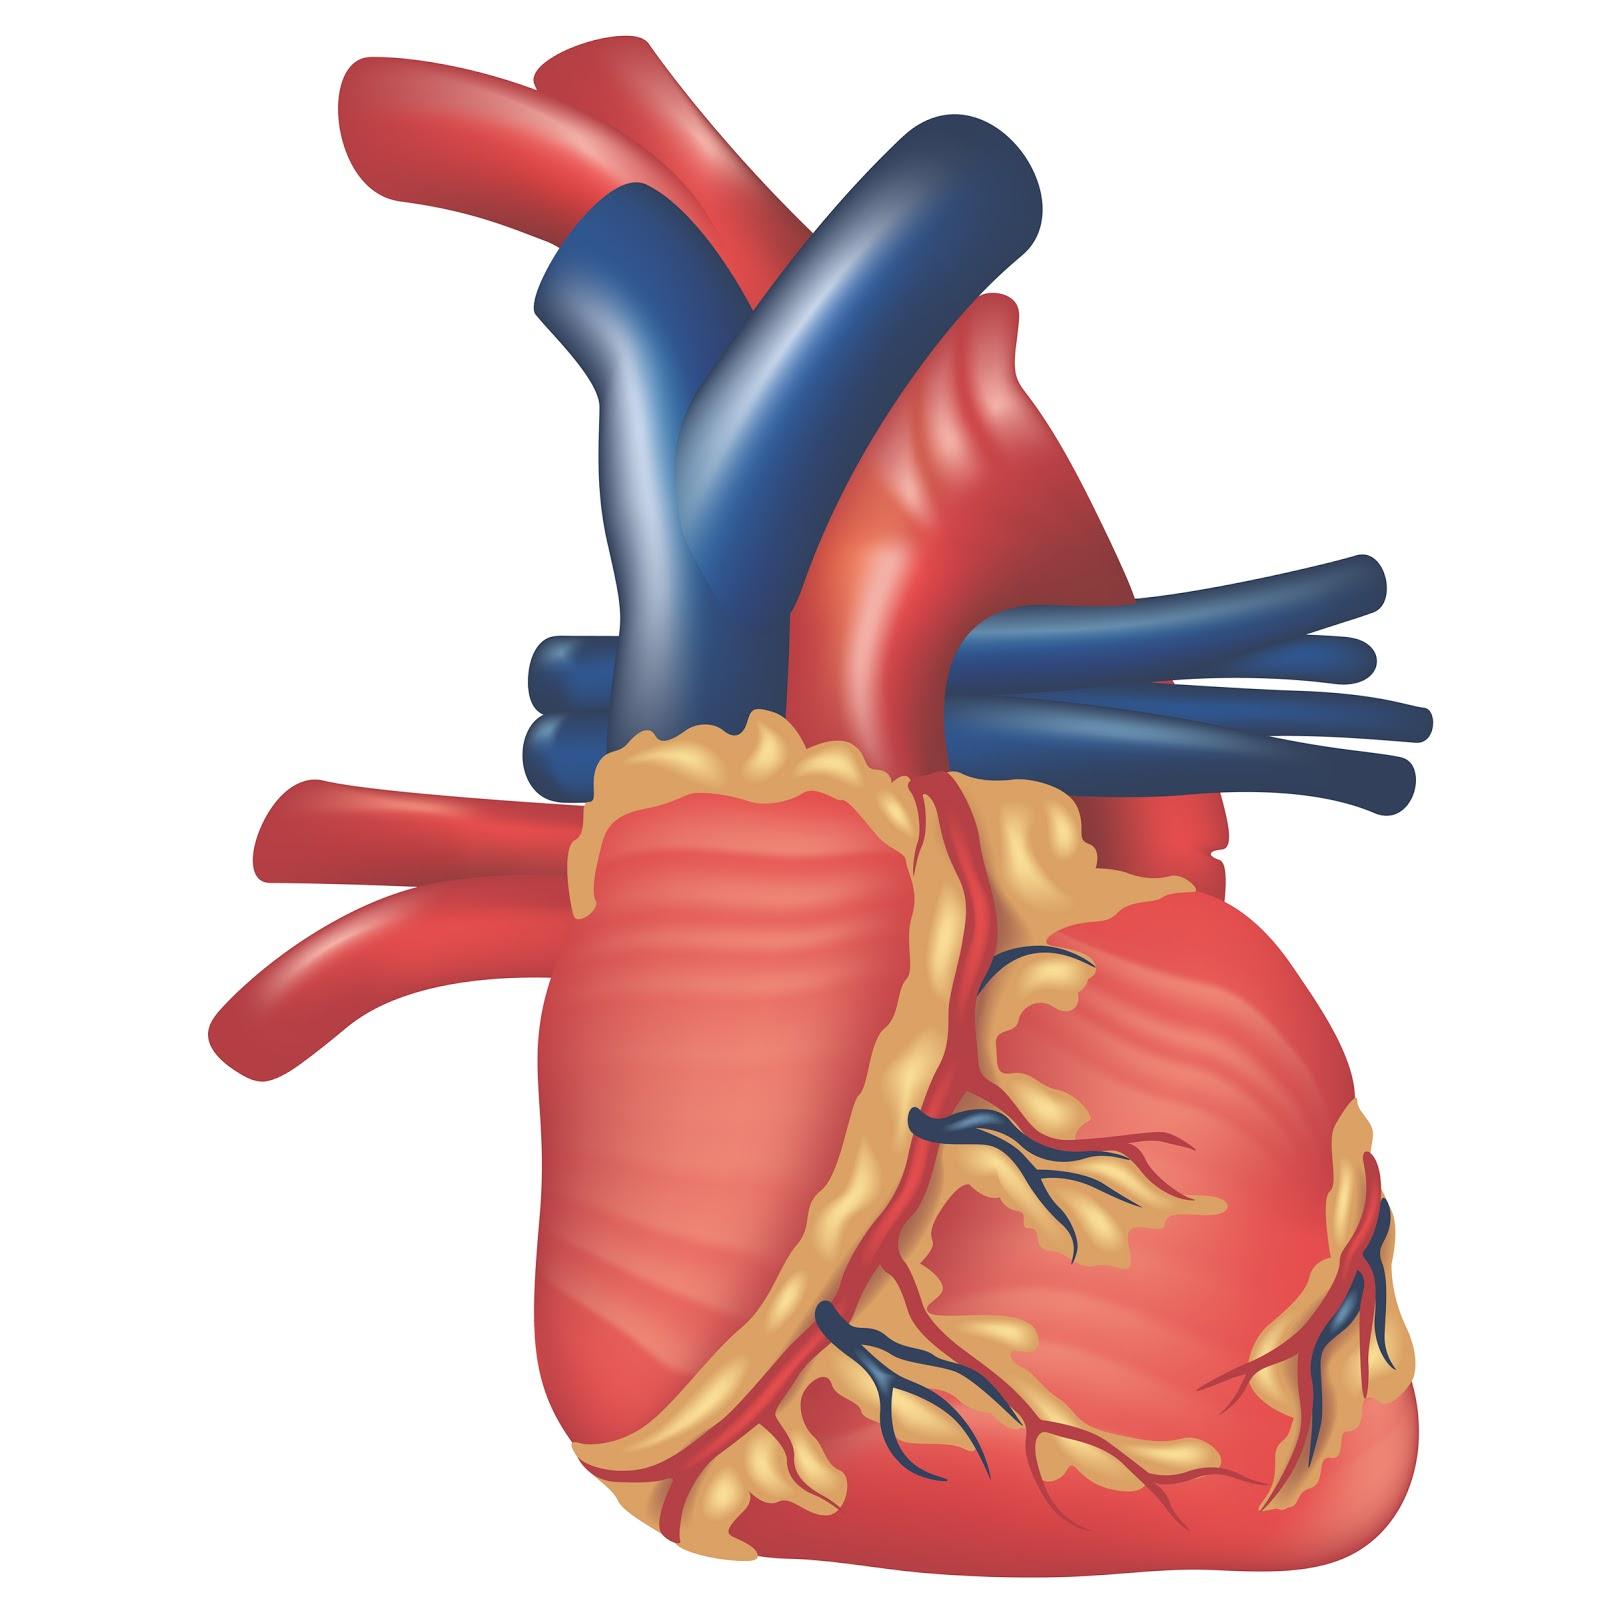 1600x1599 Simple Human Heart Diagram Simple Human Heart Diagram